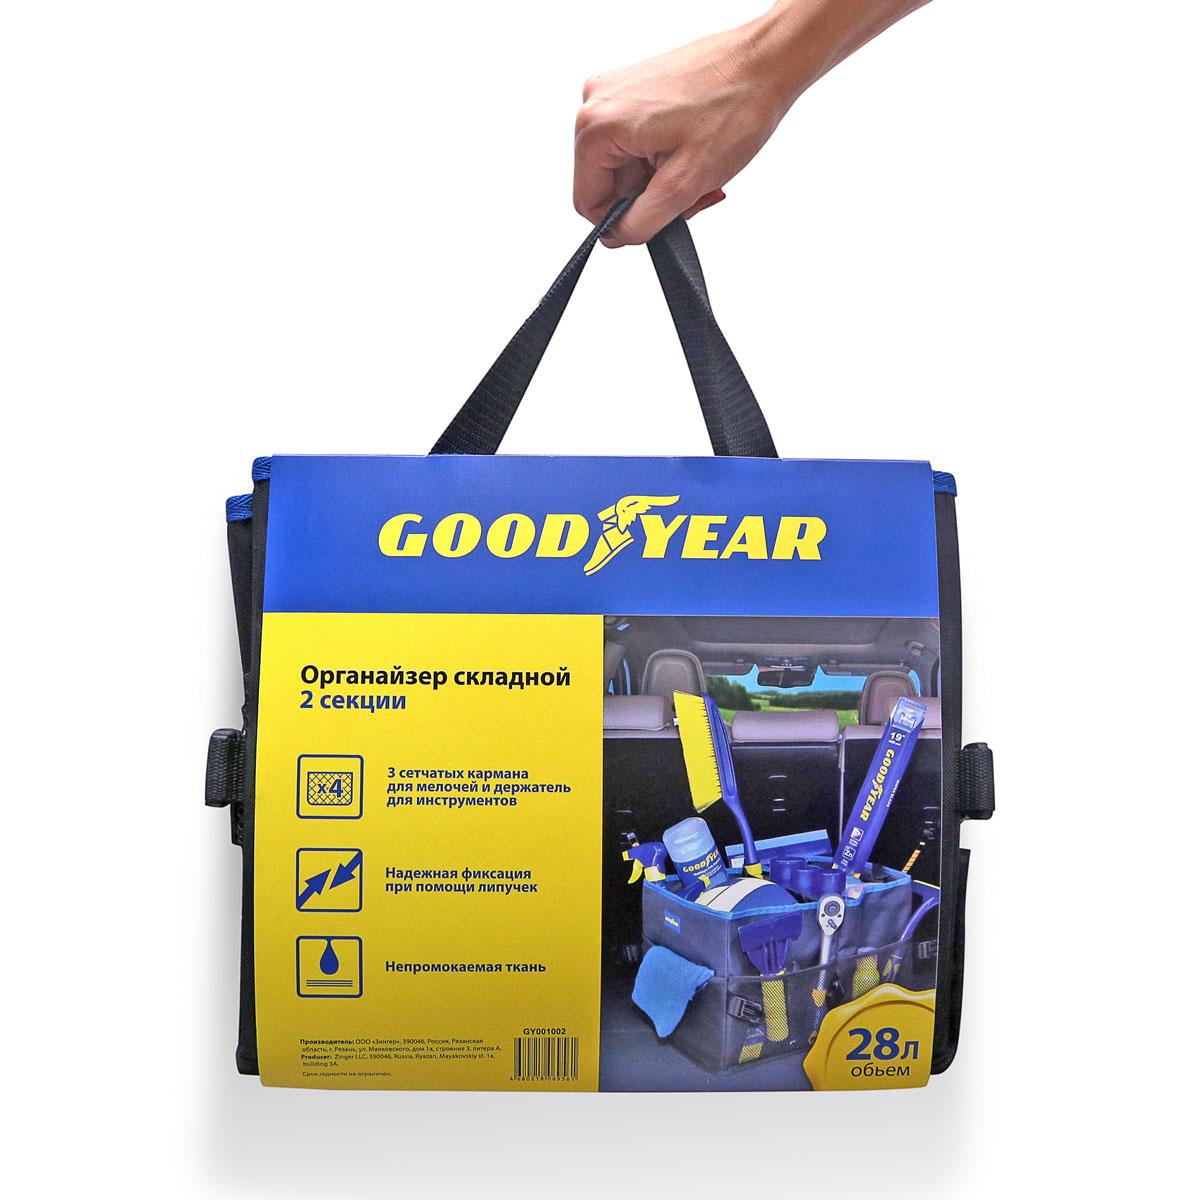 goodyear bag